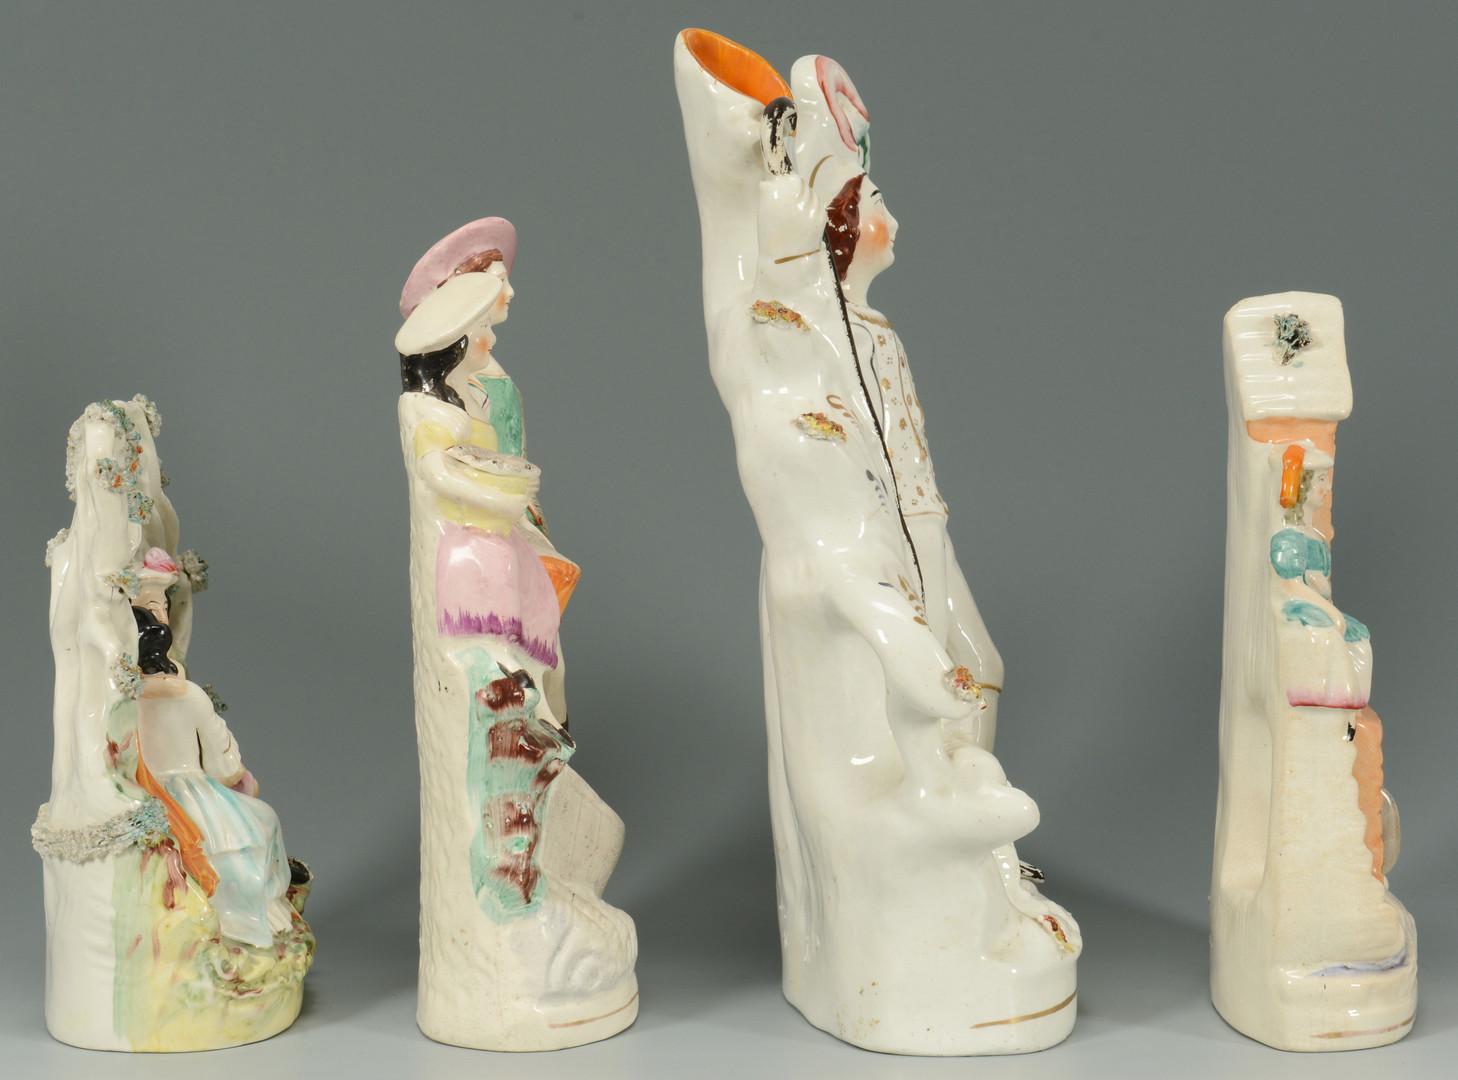 Lot 759: 4 Staffordshire Pottery Figurals